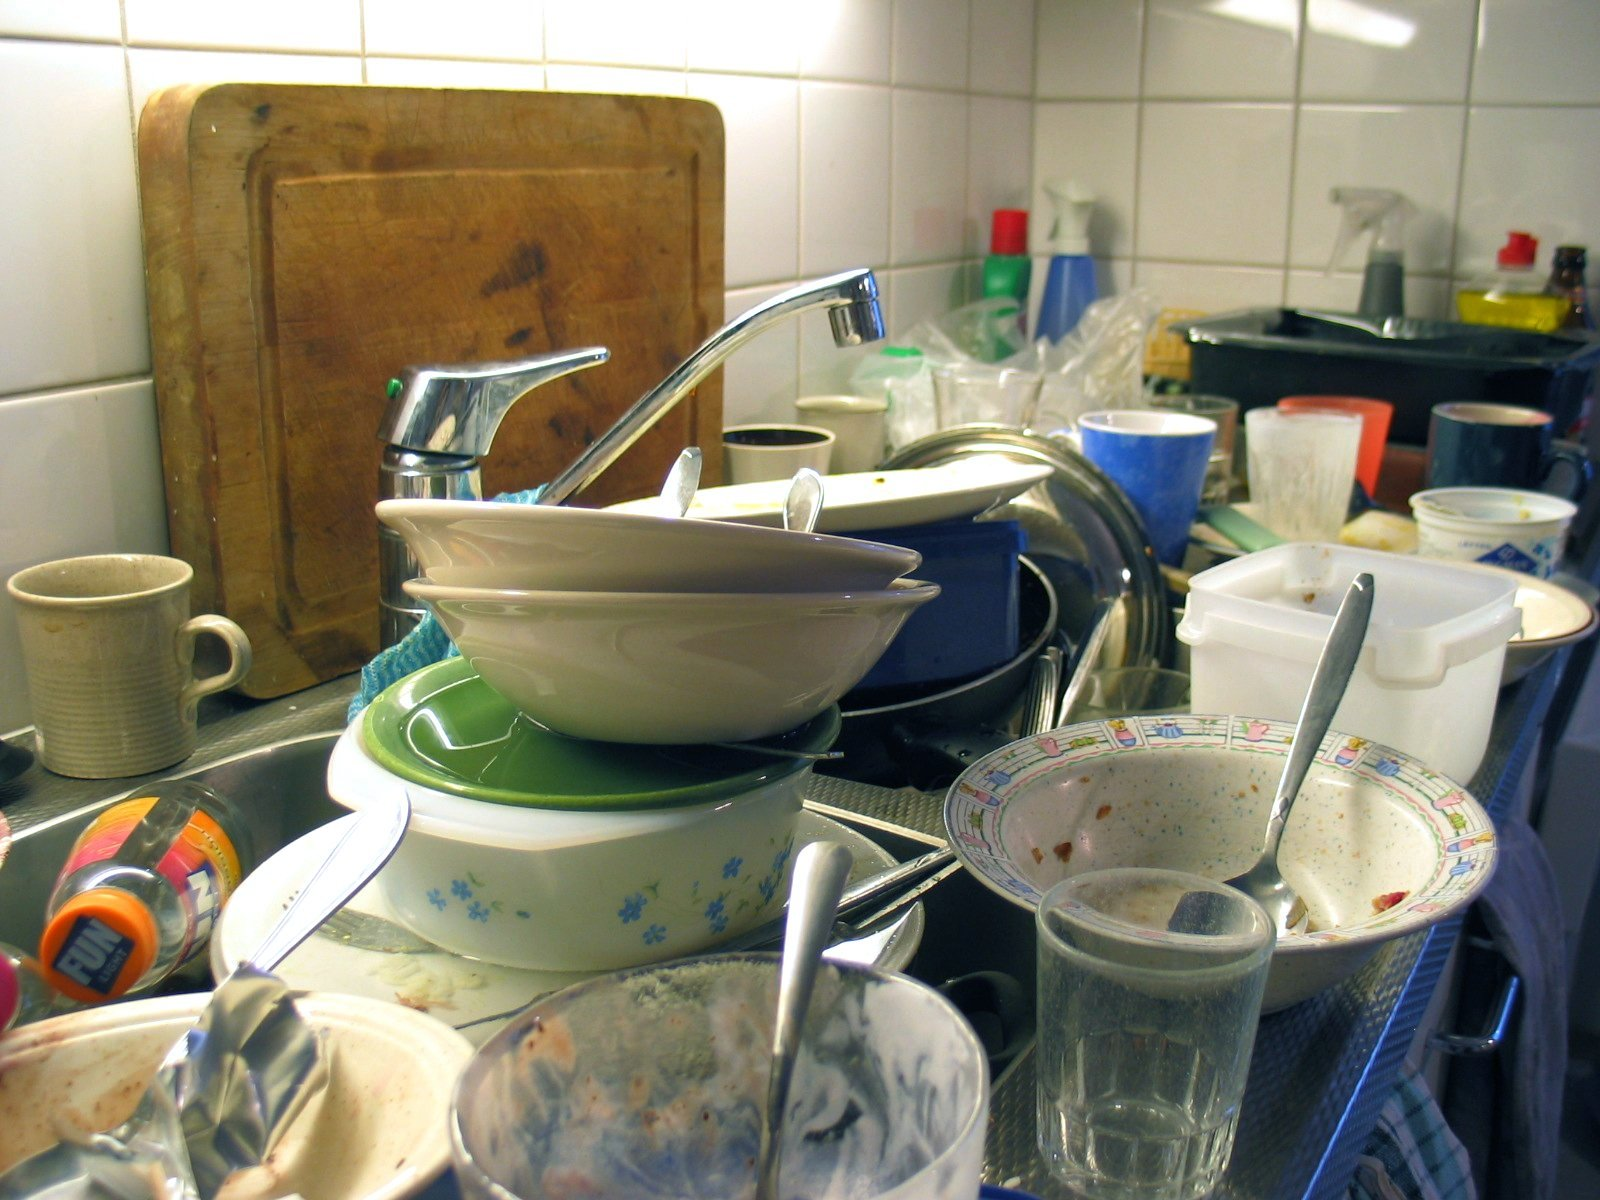 Dirty Dish Clip Art Dirty_dishes.jpg